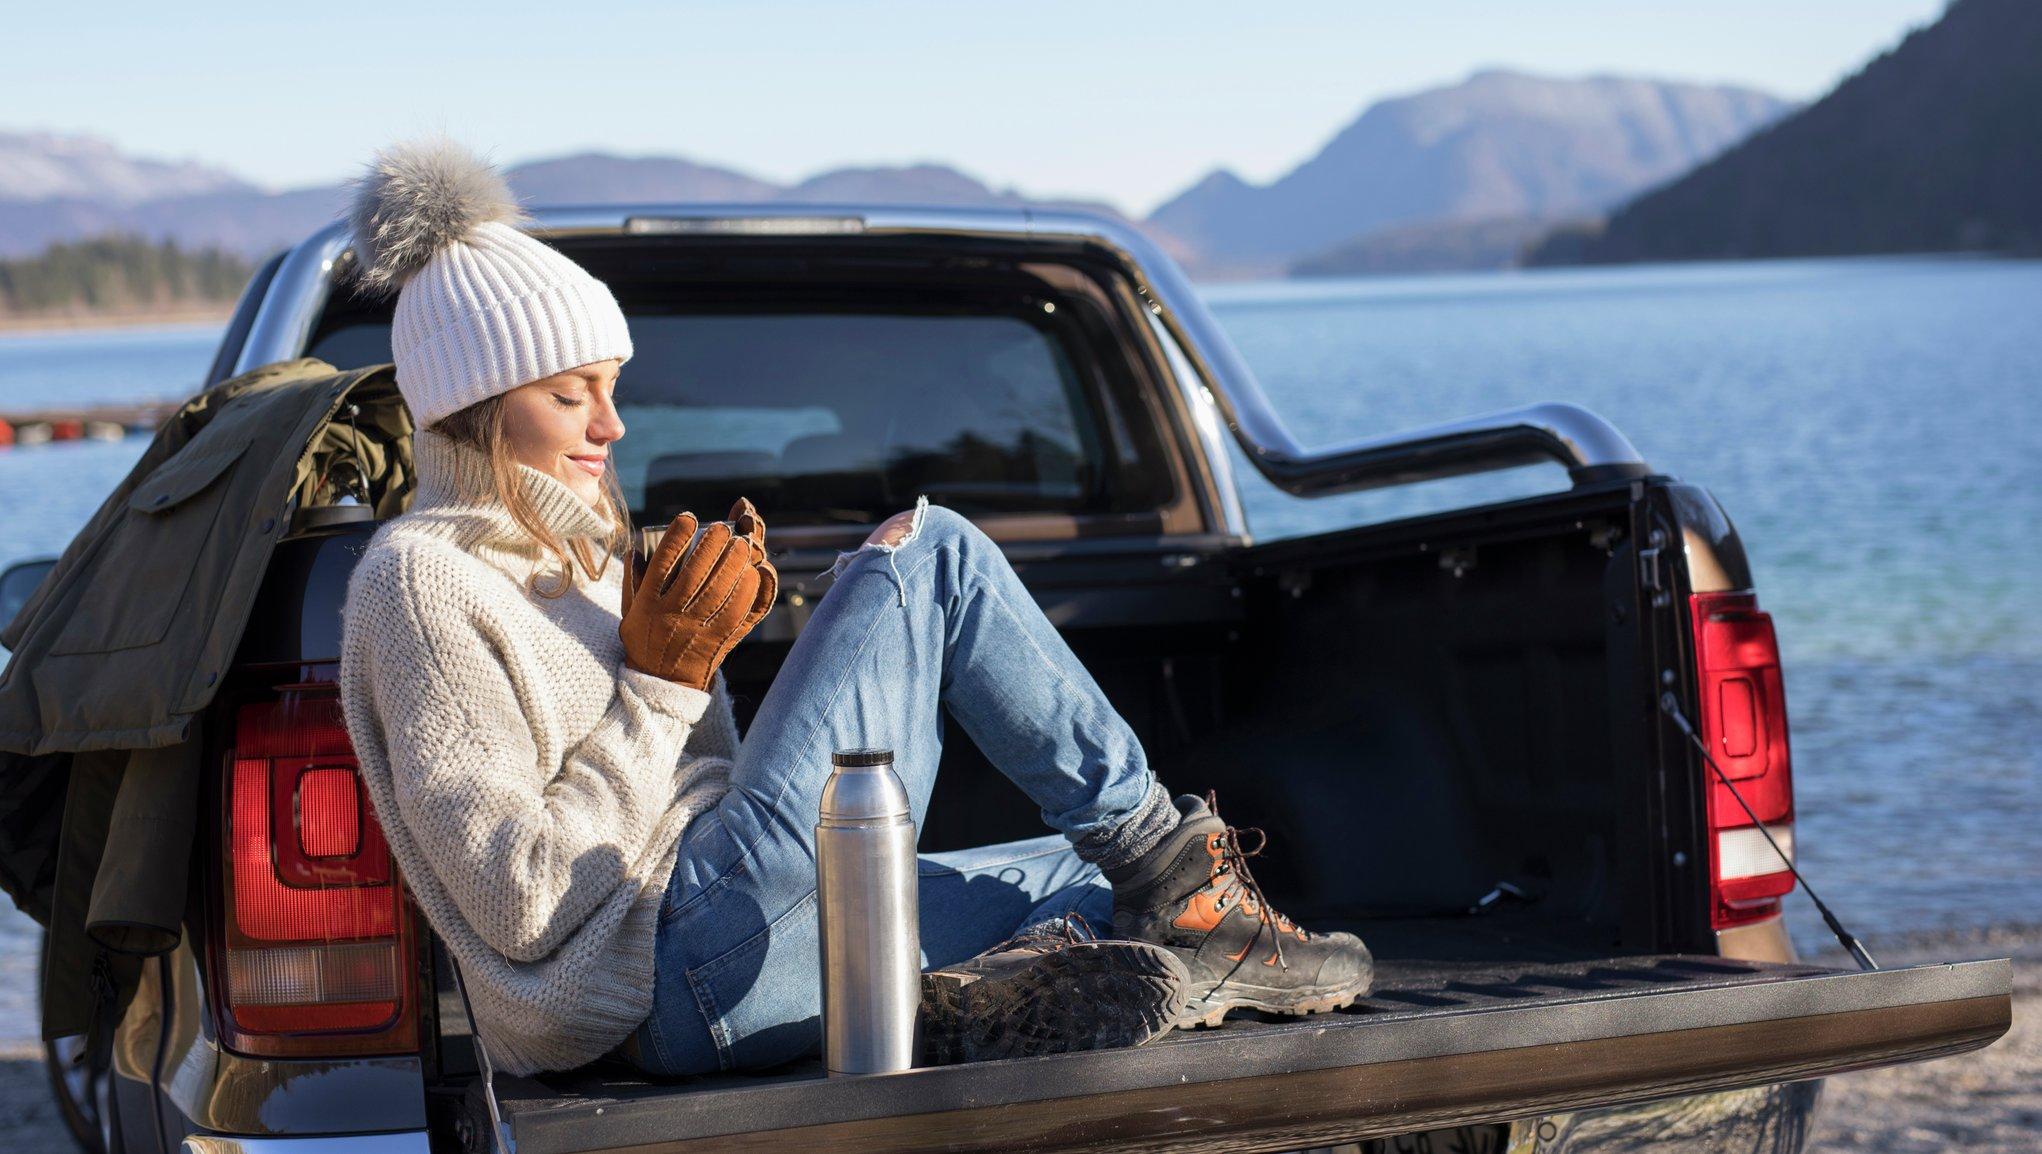 Dame på bilferie i Norge